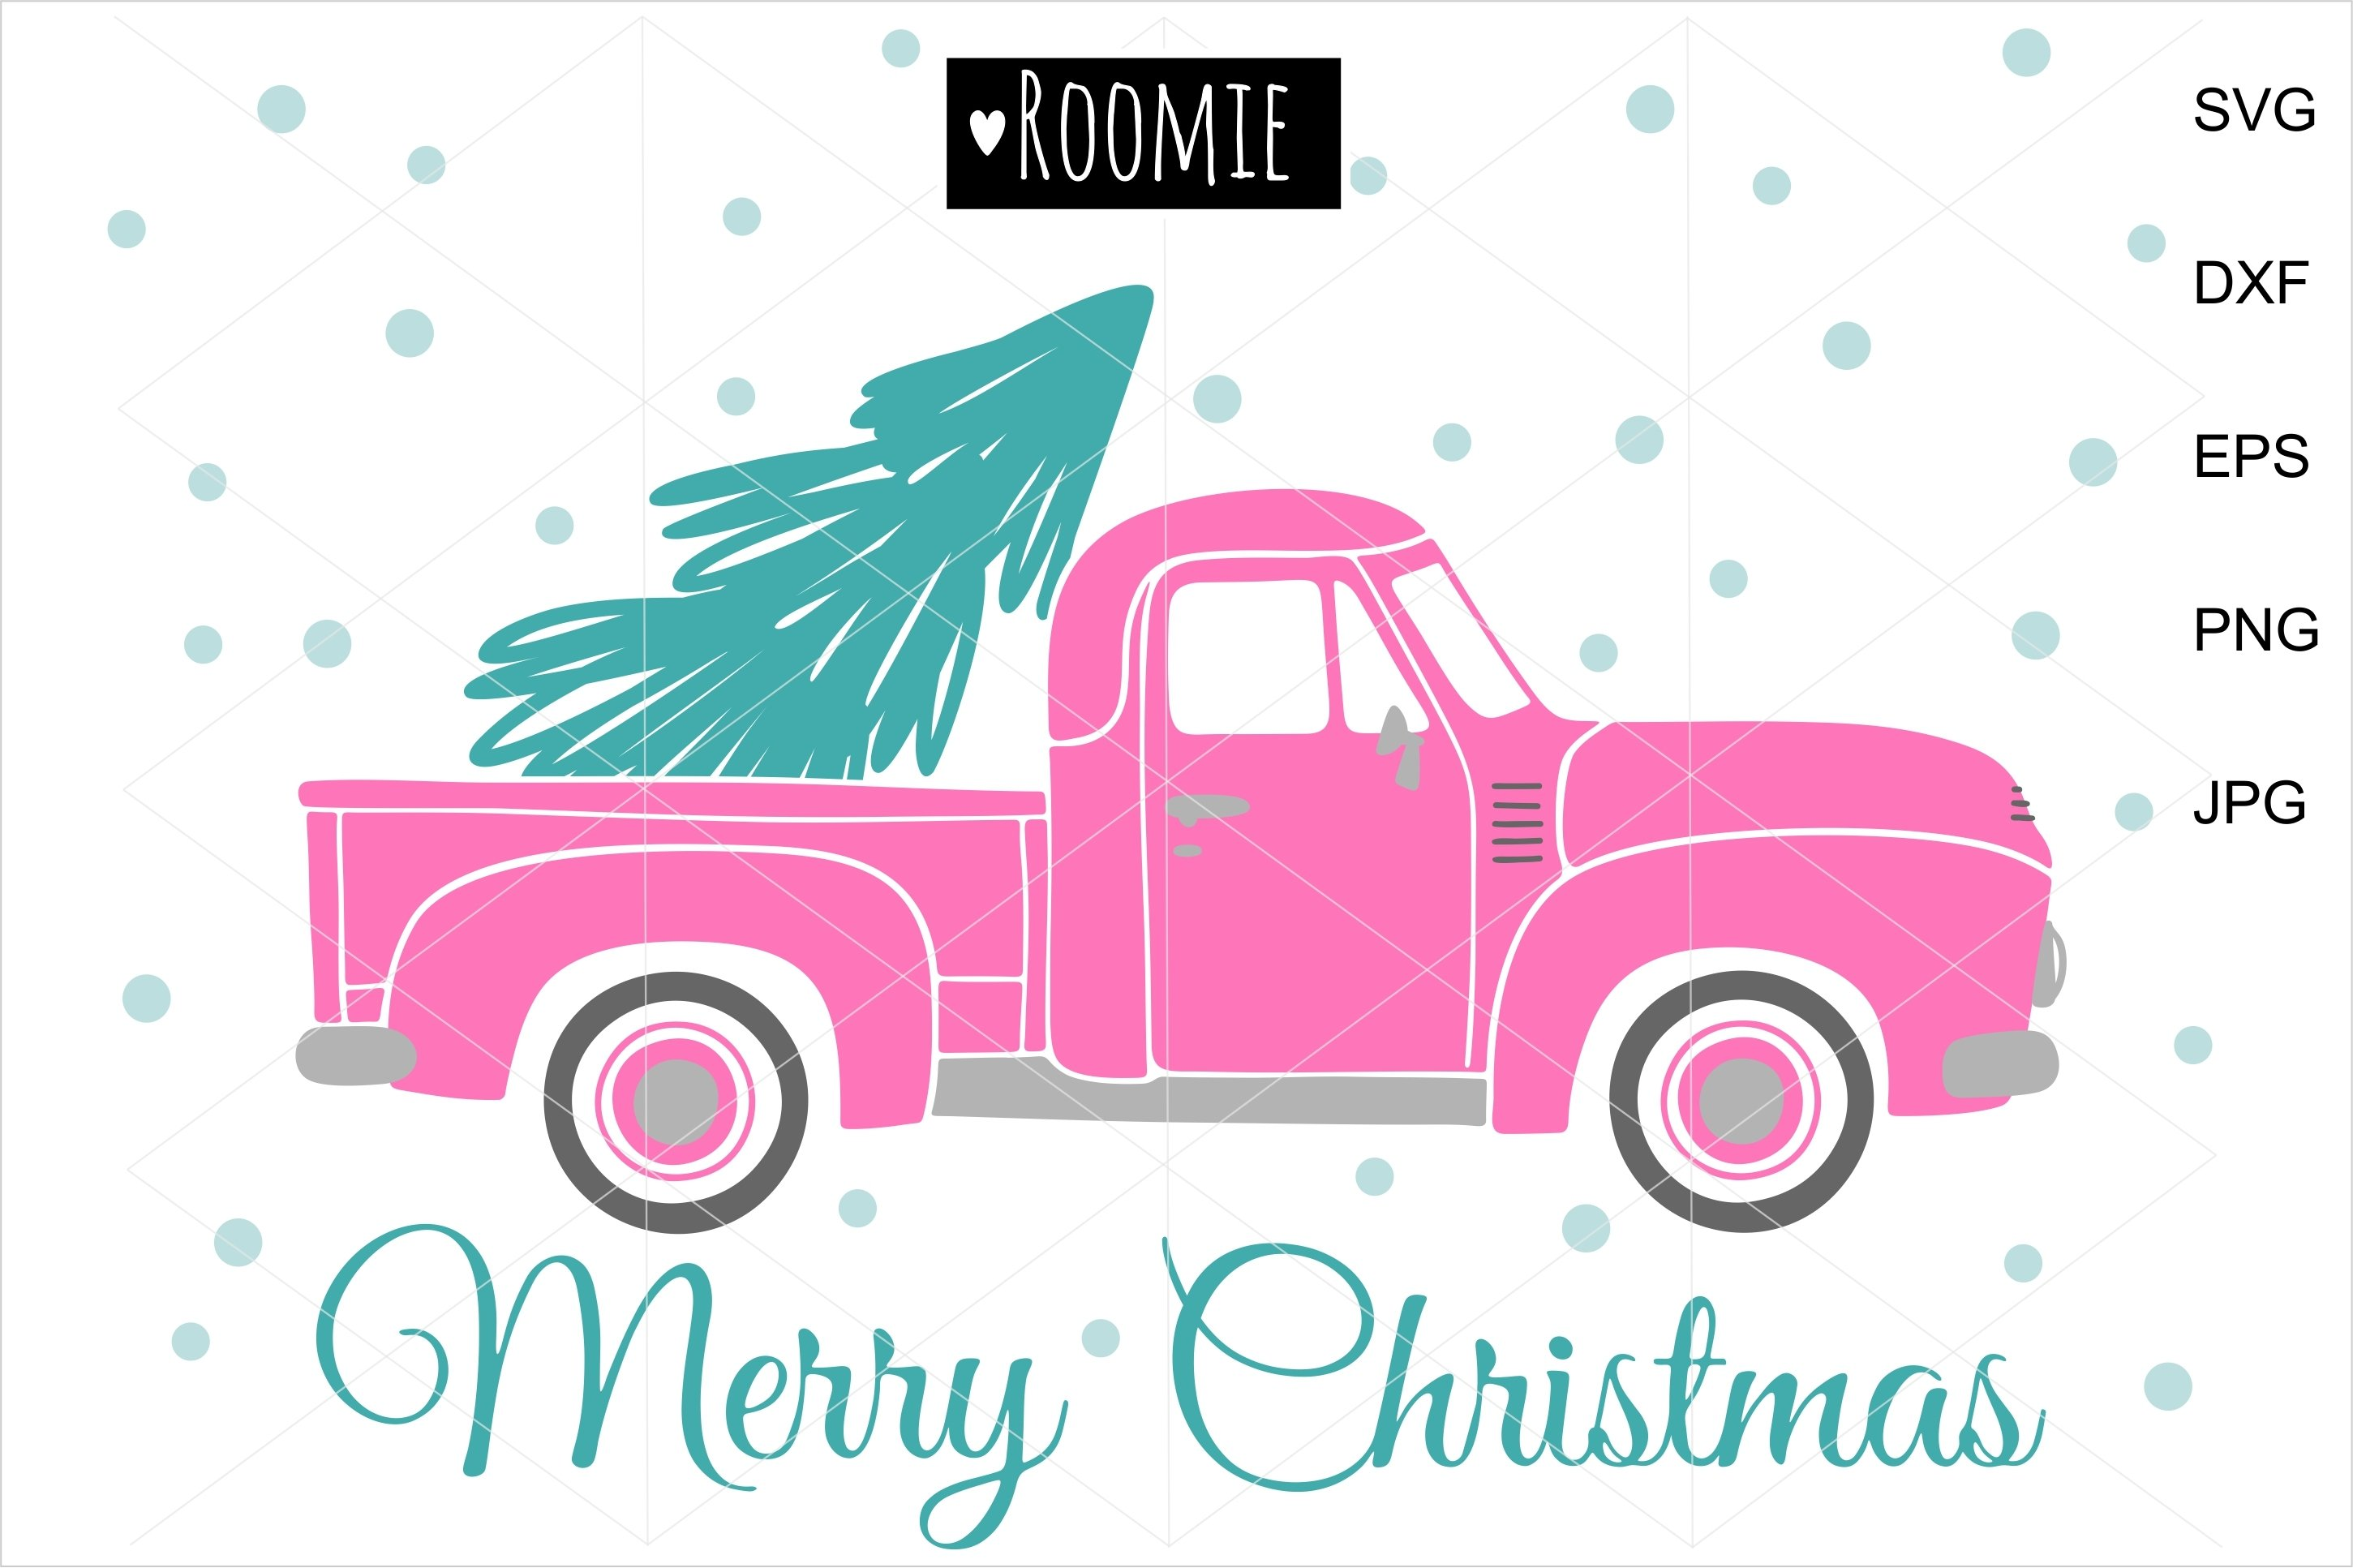 Merry Christmas Vintage Pink Retro Truck Christmas Tree Svg 976135 Cut Files Design Bundles